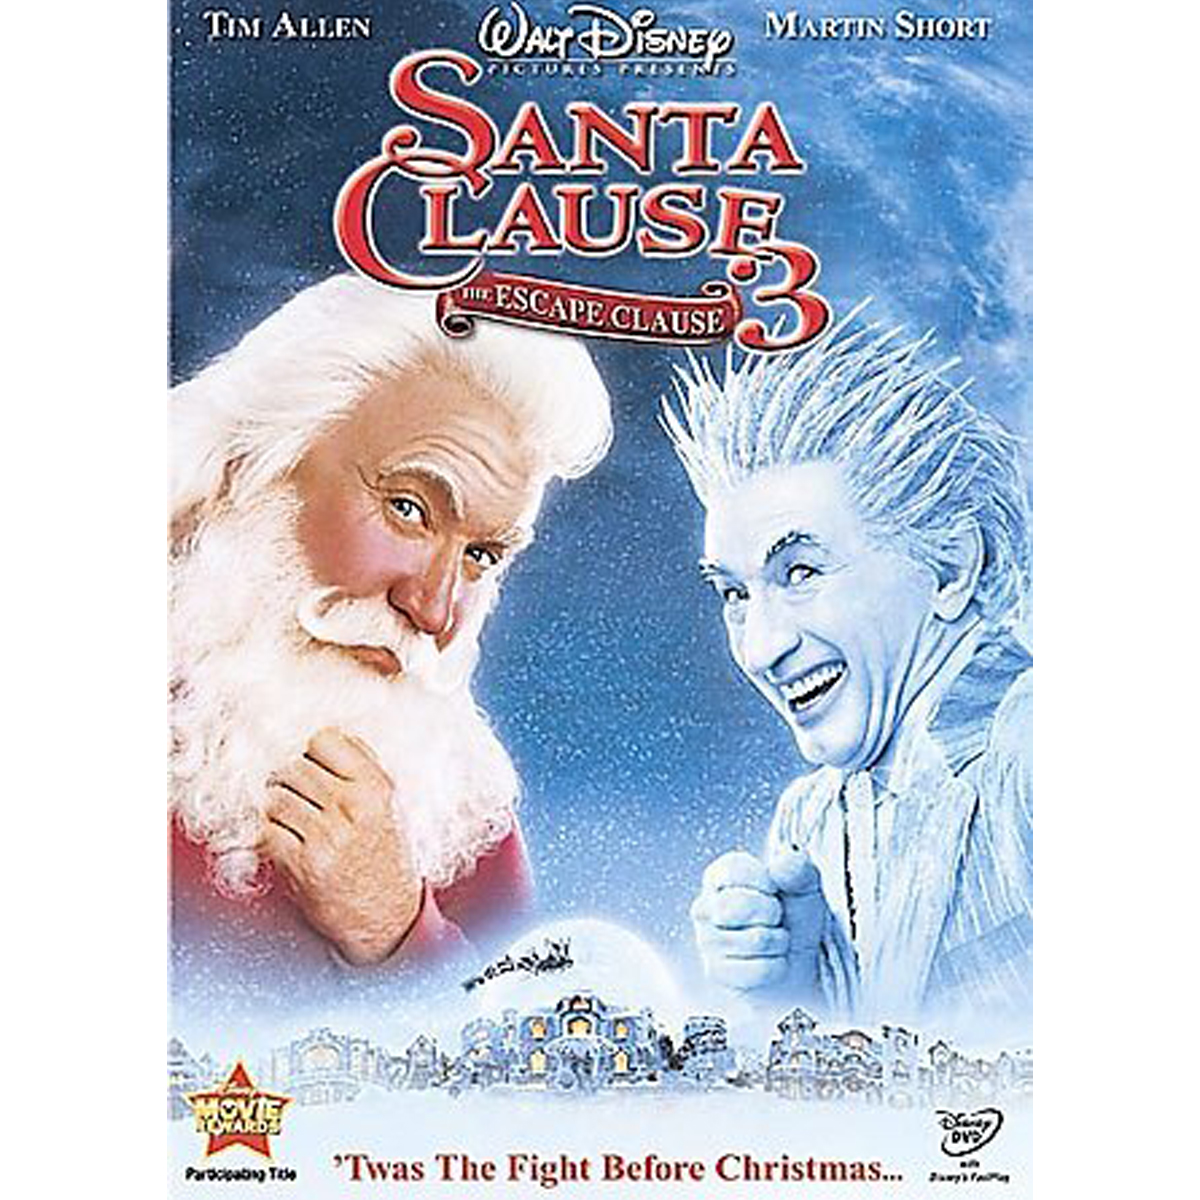 Santa Clause 3 DVD: Escape Clause